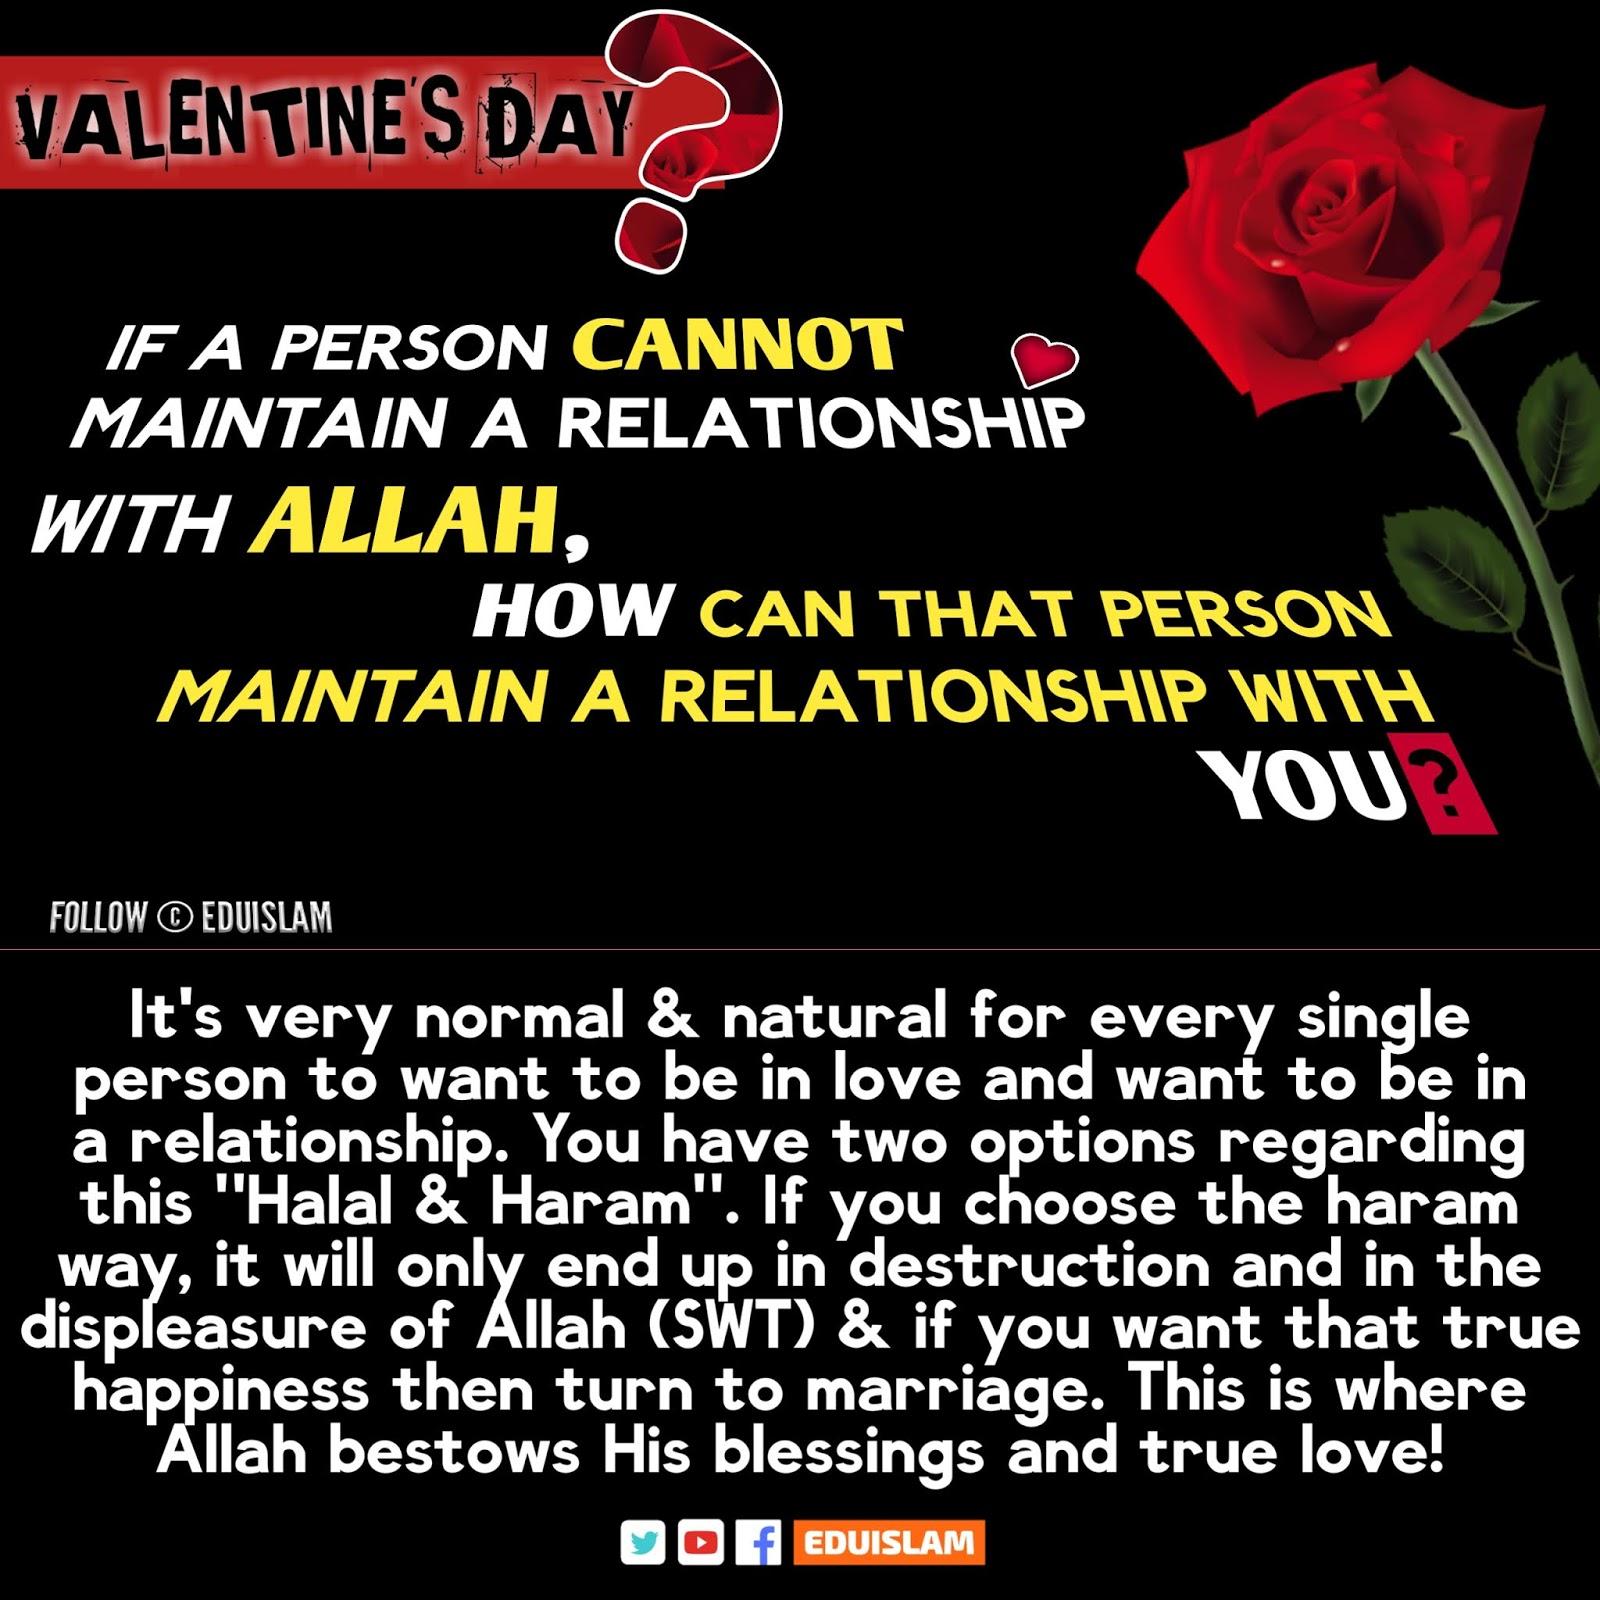 Valentine's Day Islam quote, Islamic quotes about Valentine's Day, Valentine's day haram Islam quotes, urdu, What Islam says about Valentine's day, Quran About Valentine's Day, Haram or Halal, Scholars, EduIslam